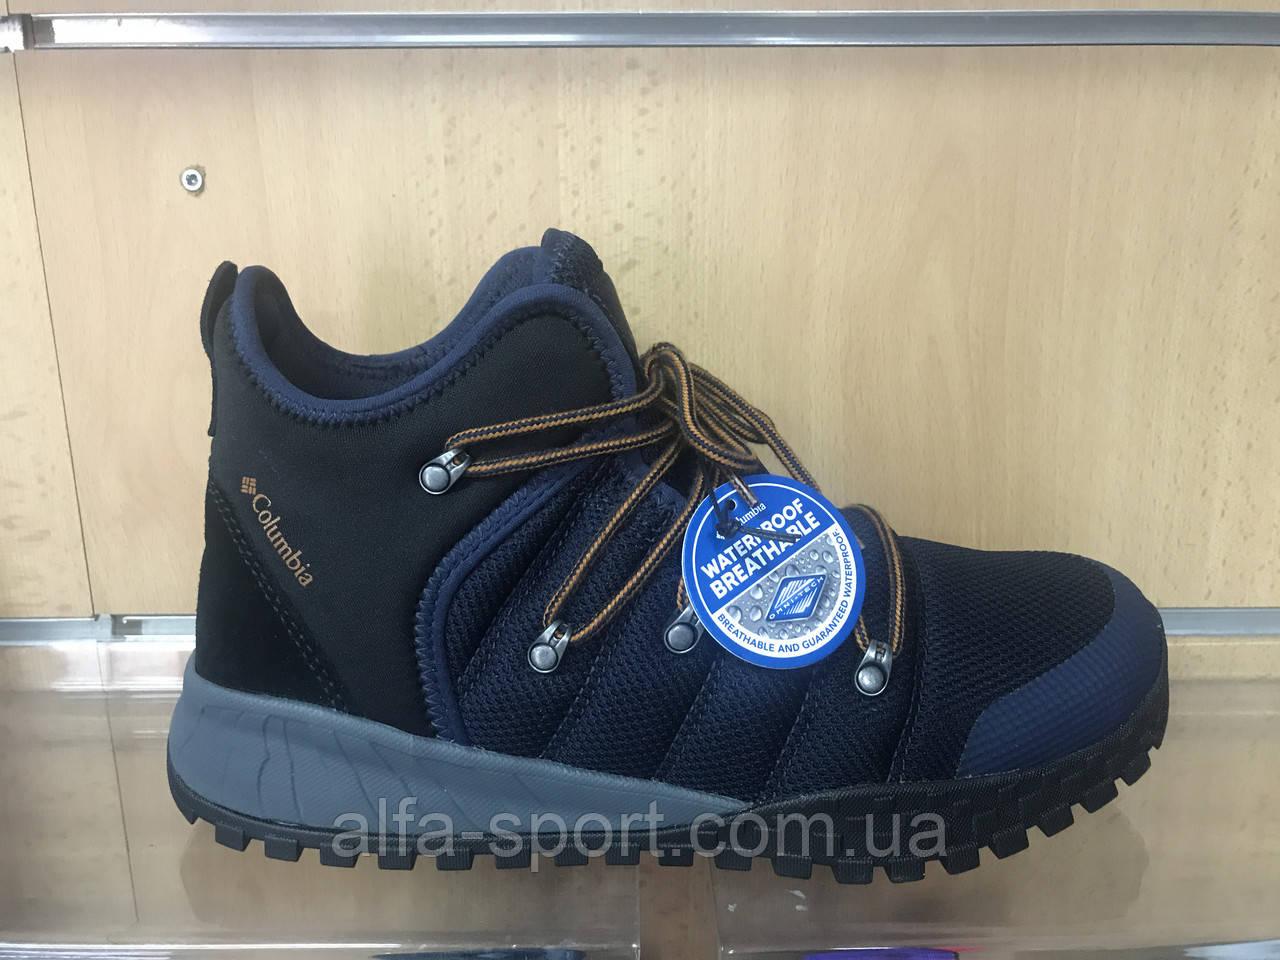 d5dfaaac4a4e3 Ботинки Columbia Fairbanks 503 (BM 5975-464) : продажа, цена в ...